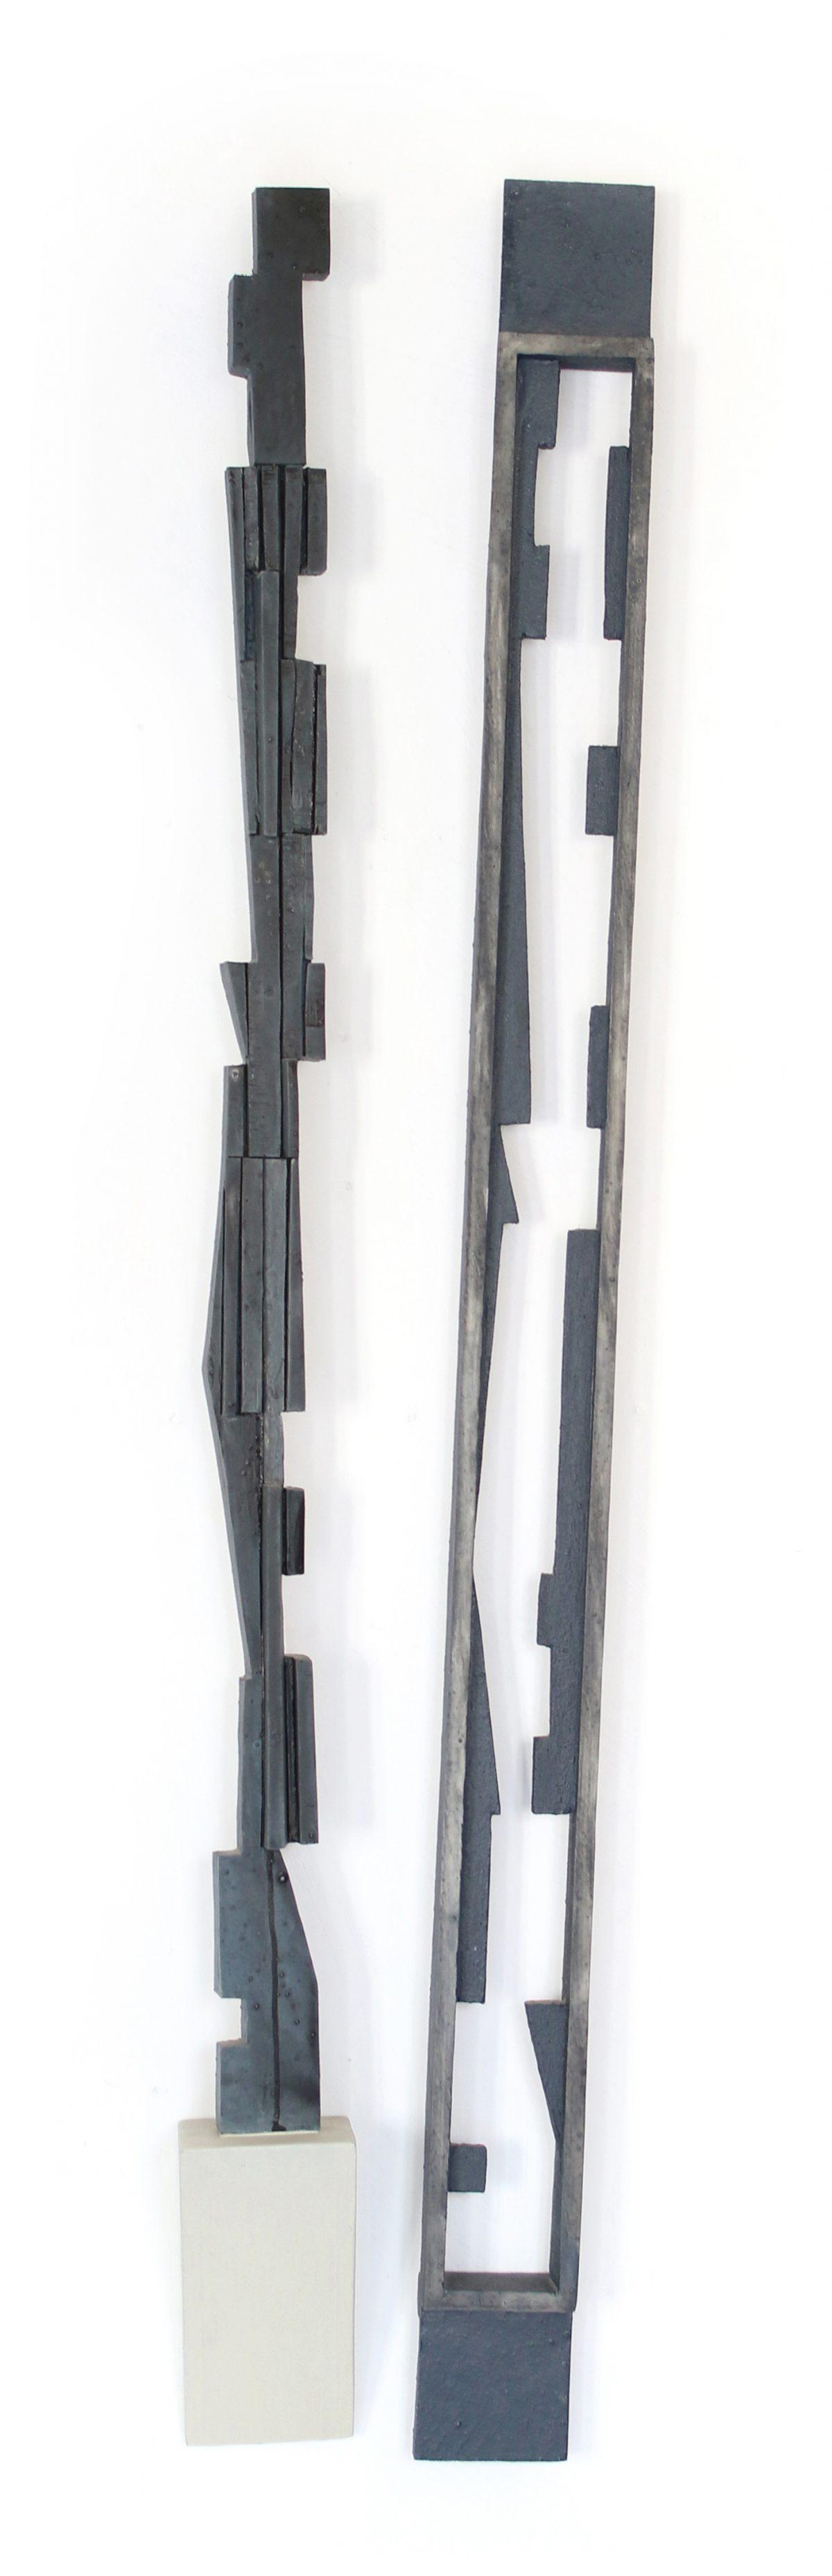 Art Atrium Tony Twigg A stick